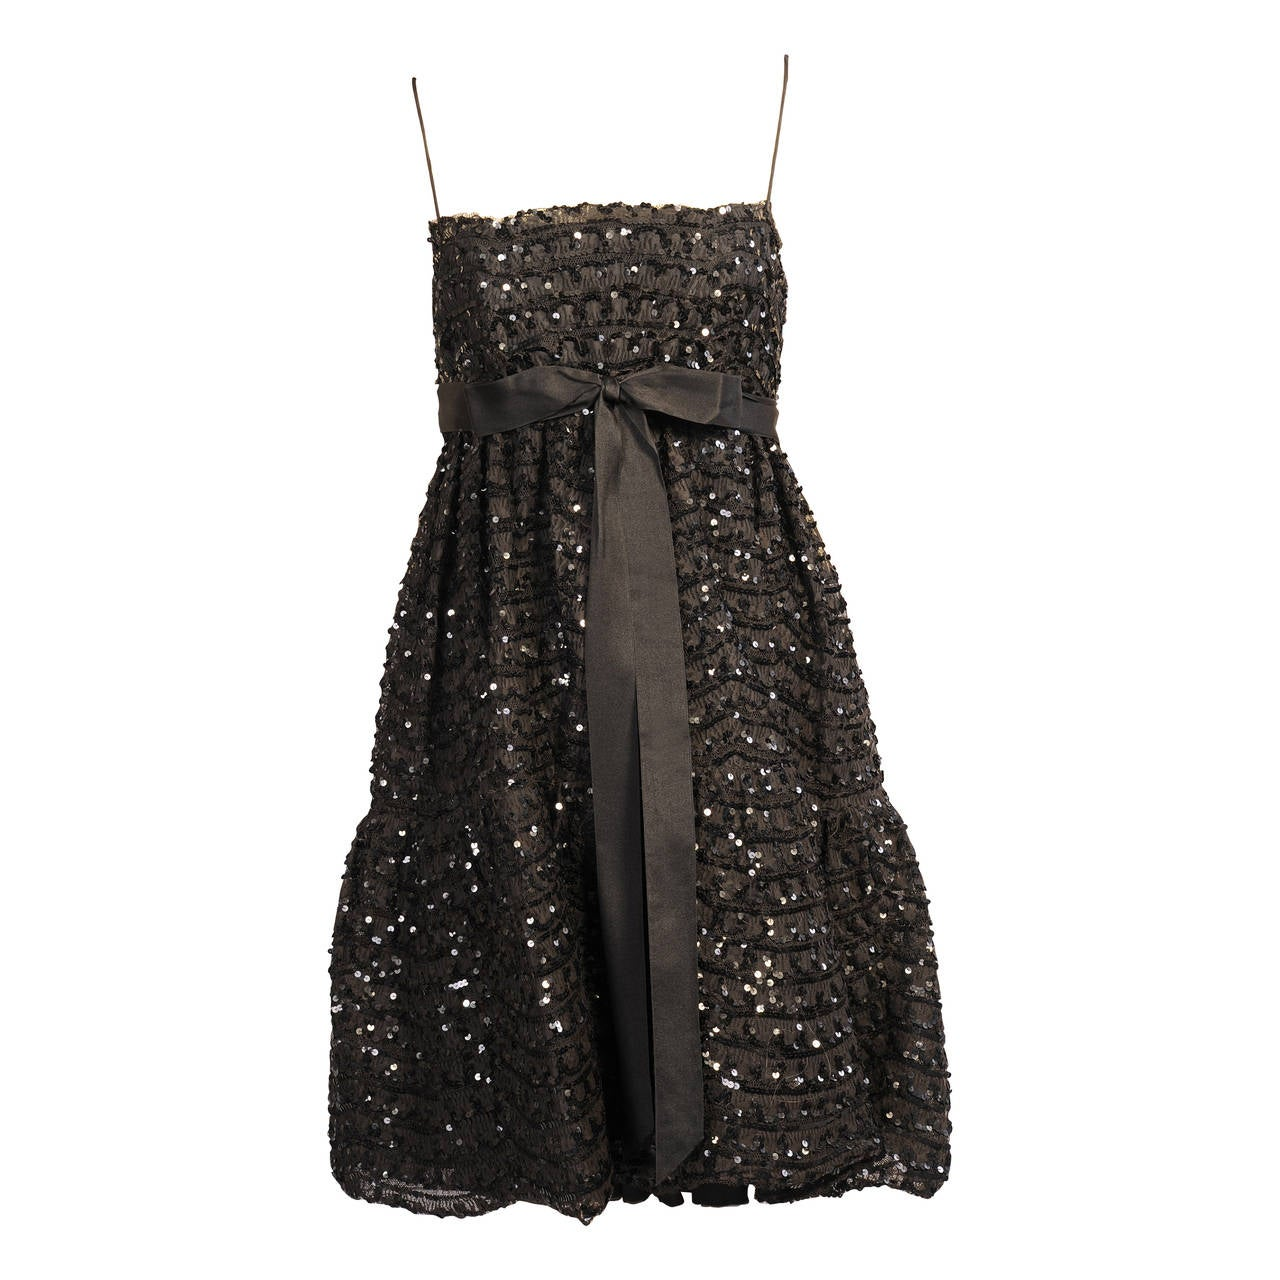 Bill Blass for Maurice Rentner Beaded Babydoll Dress 1